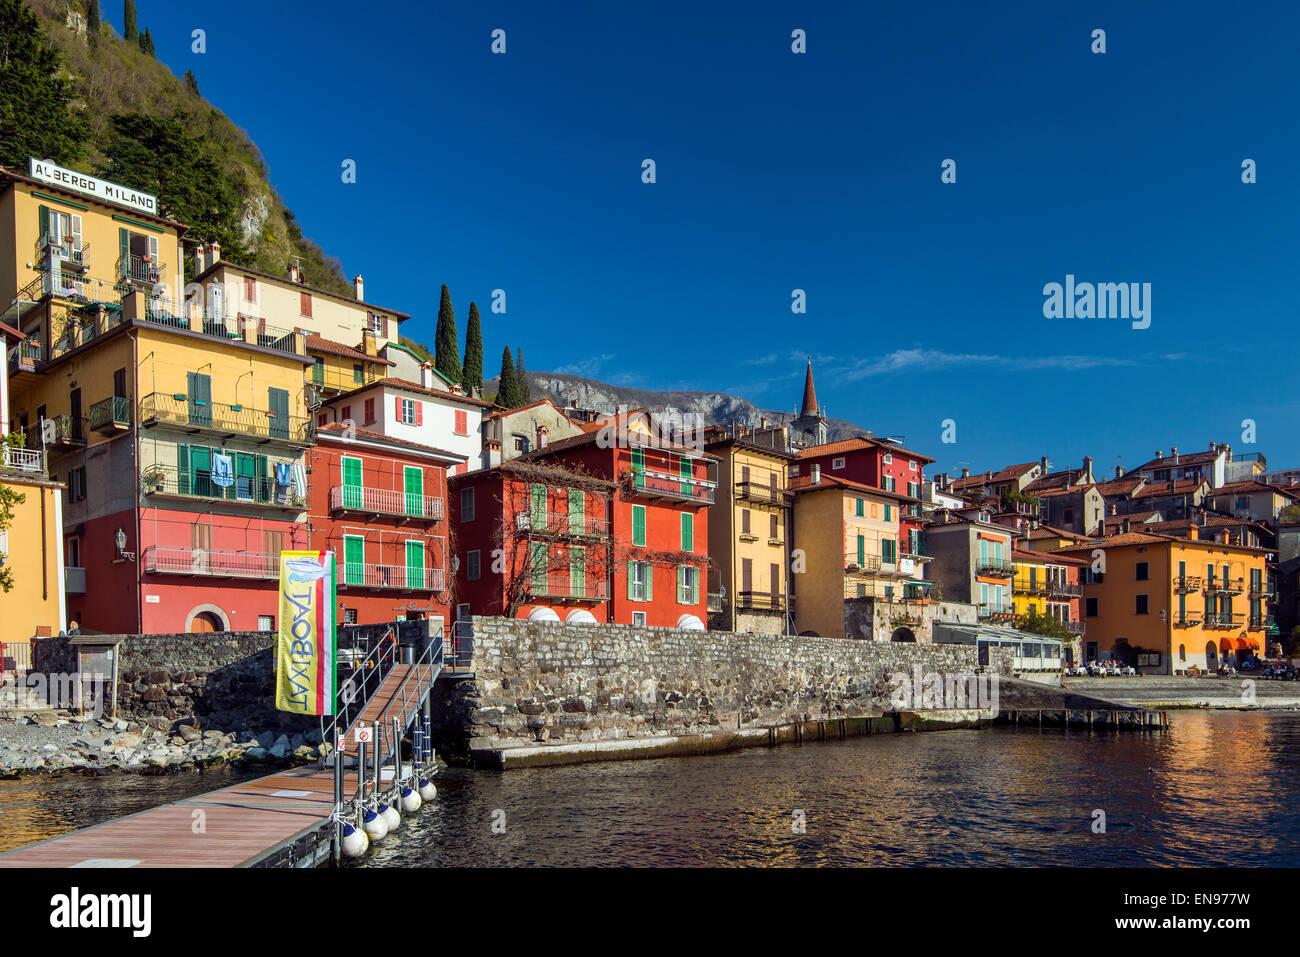 Varenna, Lake Como, Lombardy, Italy - Stock Image